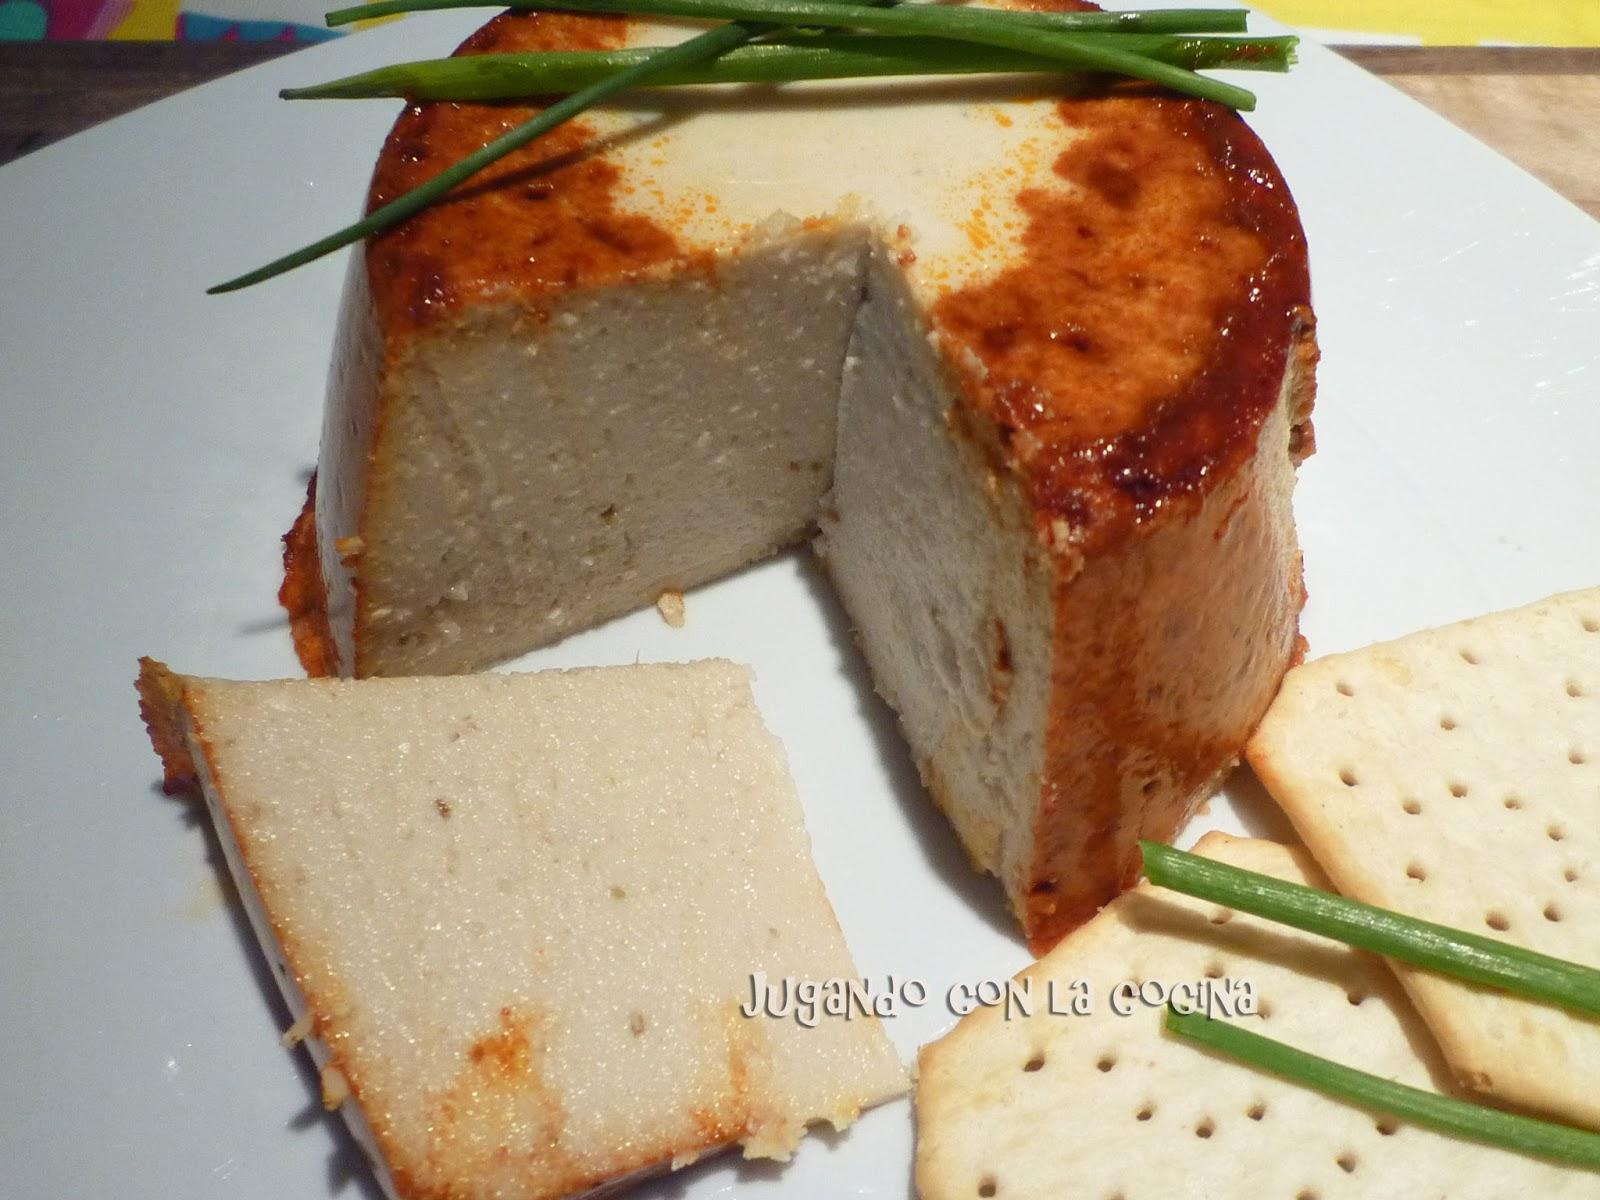 Jugando Con La Cocina Queso Vegano Duro Con Tofu Al Pimentón